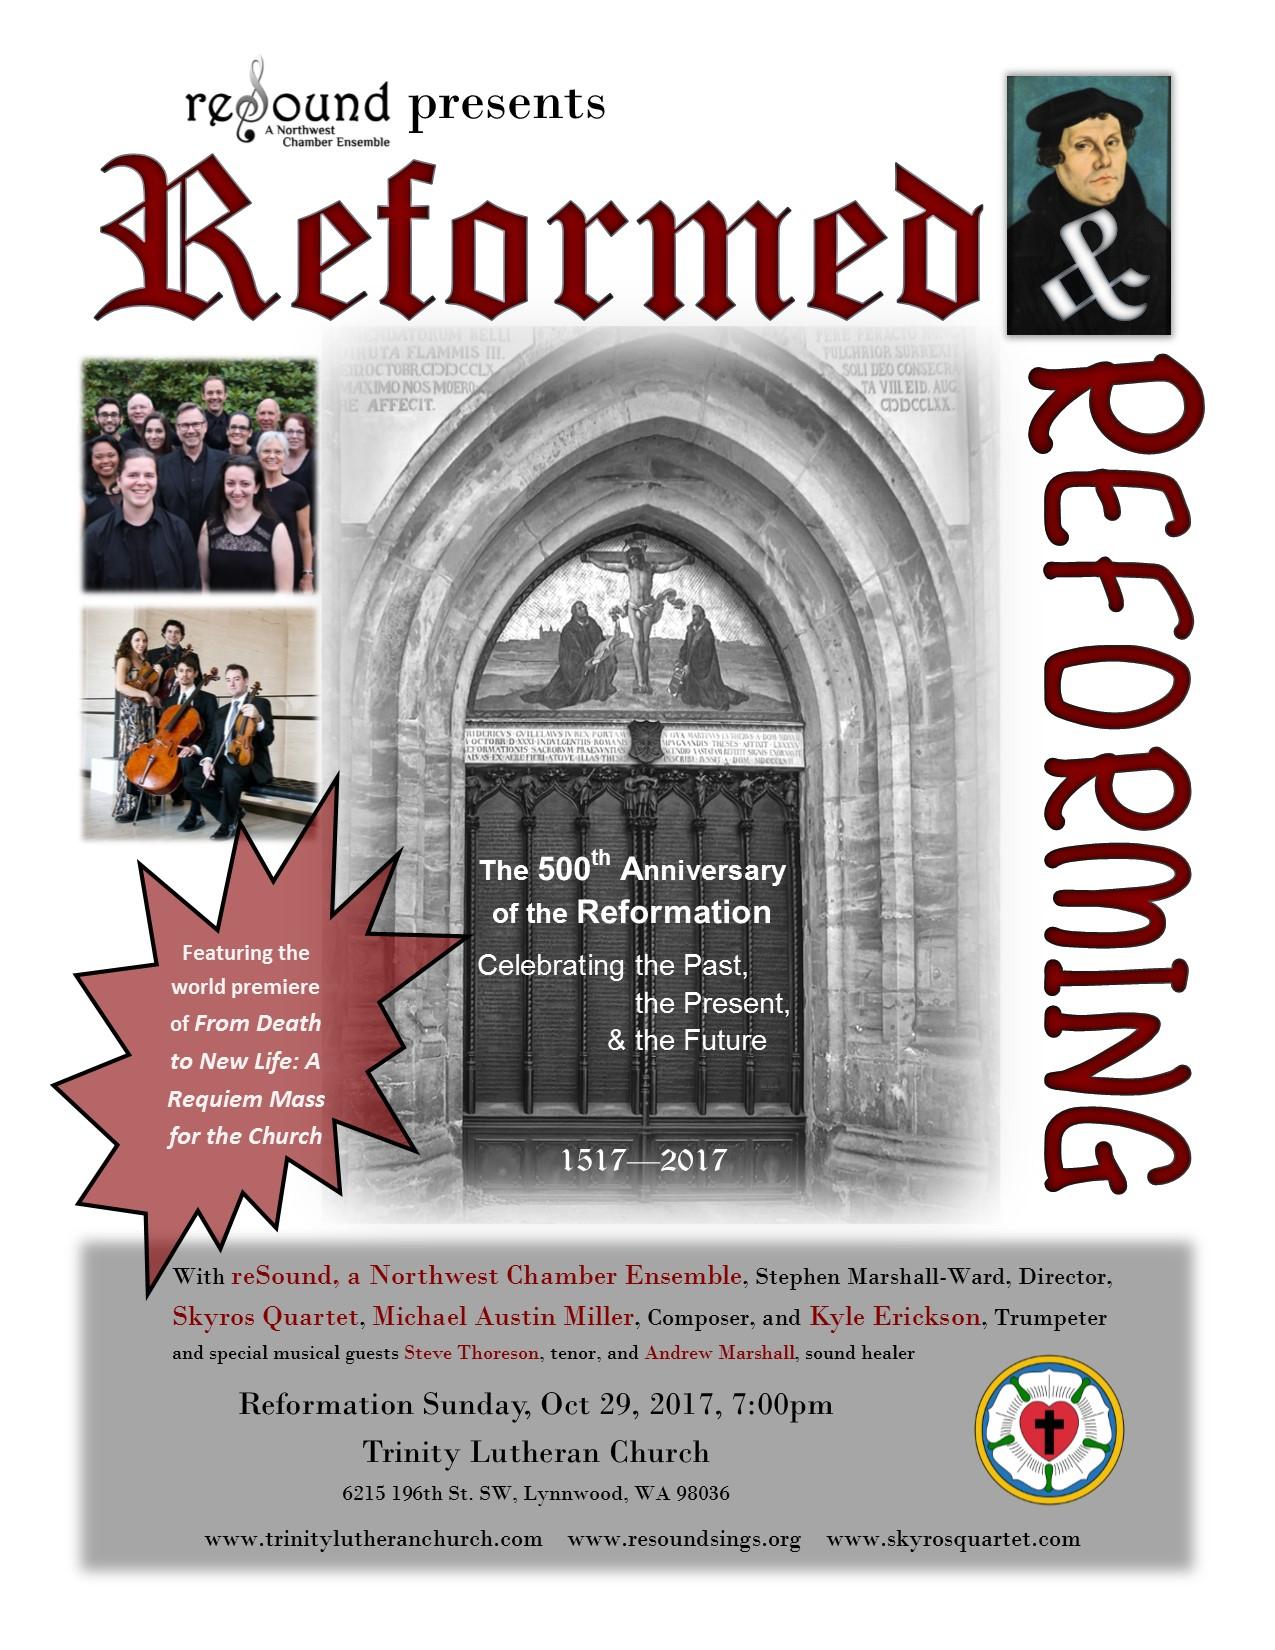 Reformation2017concertposter (2).jpg